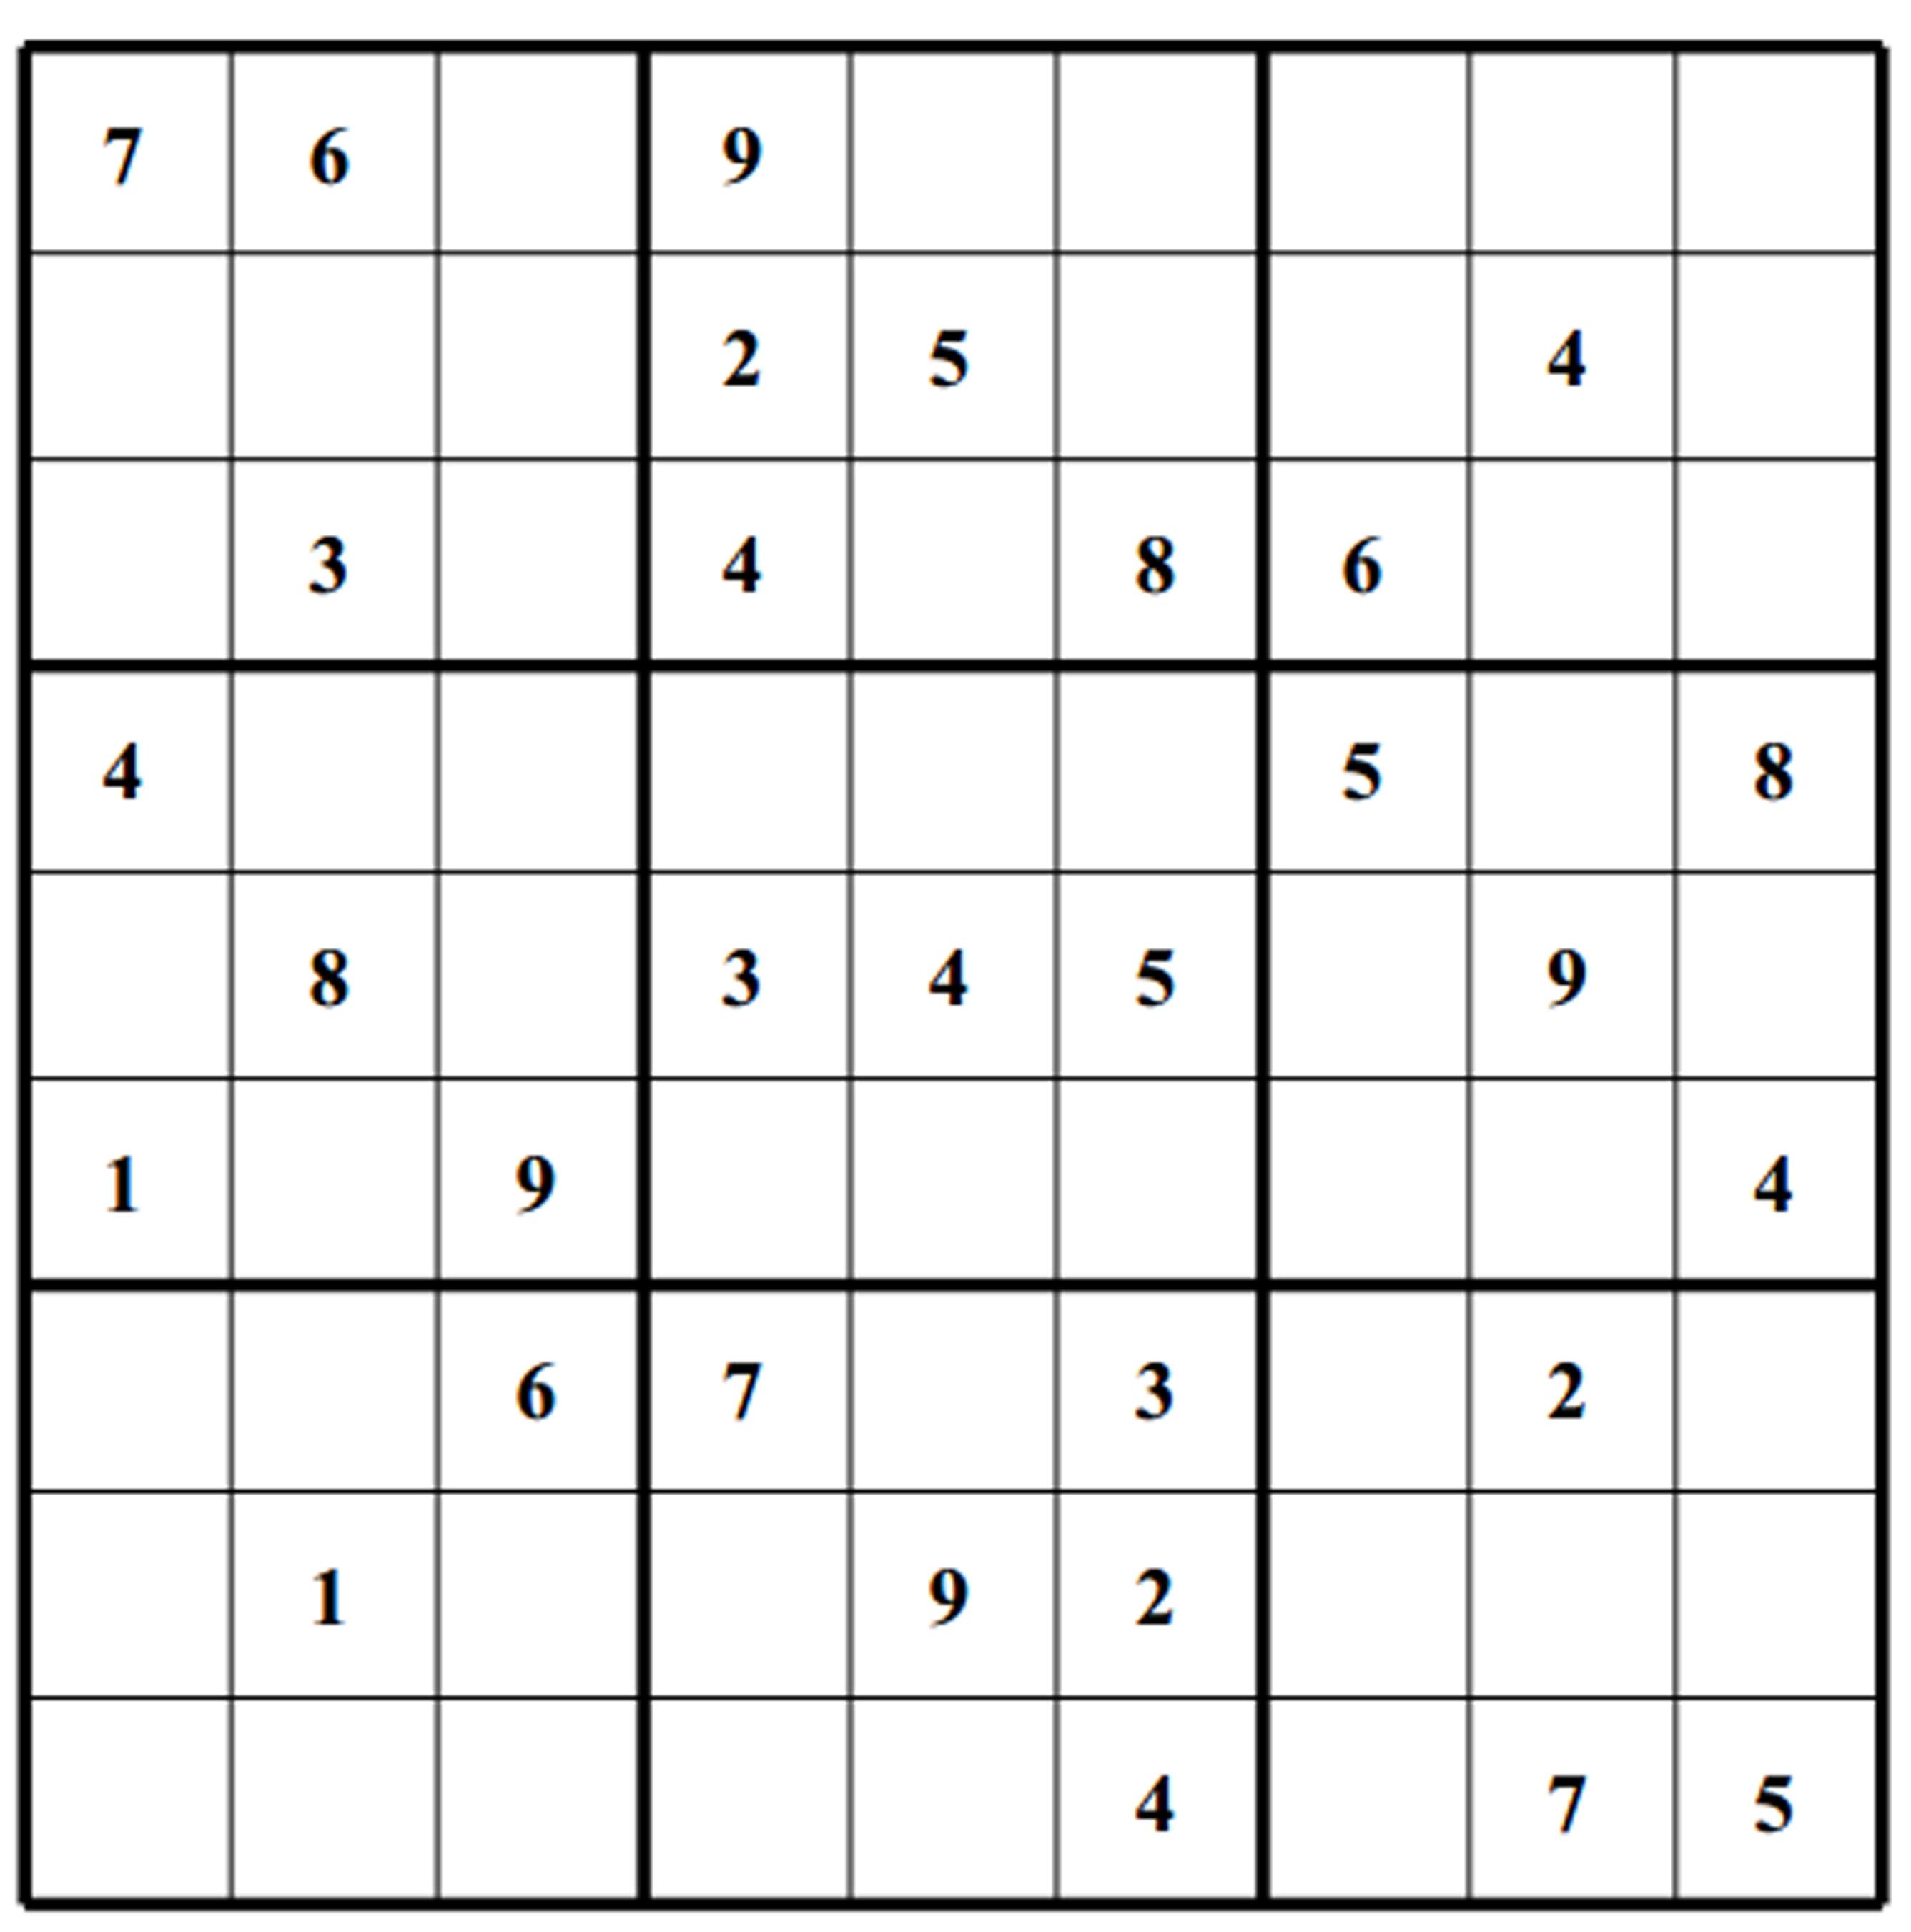 Free Sudoku Puzzles   Enjoy Daily Free Sudoku Puzzles From Walapie - 5 Star Sudoku Puzzles Printable